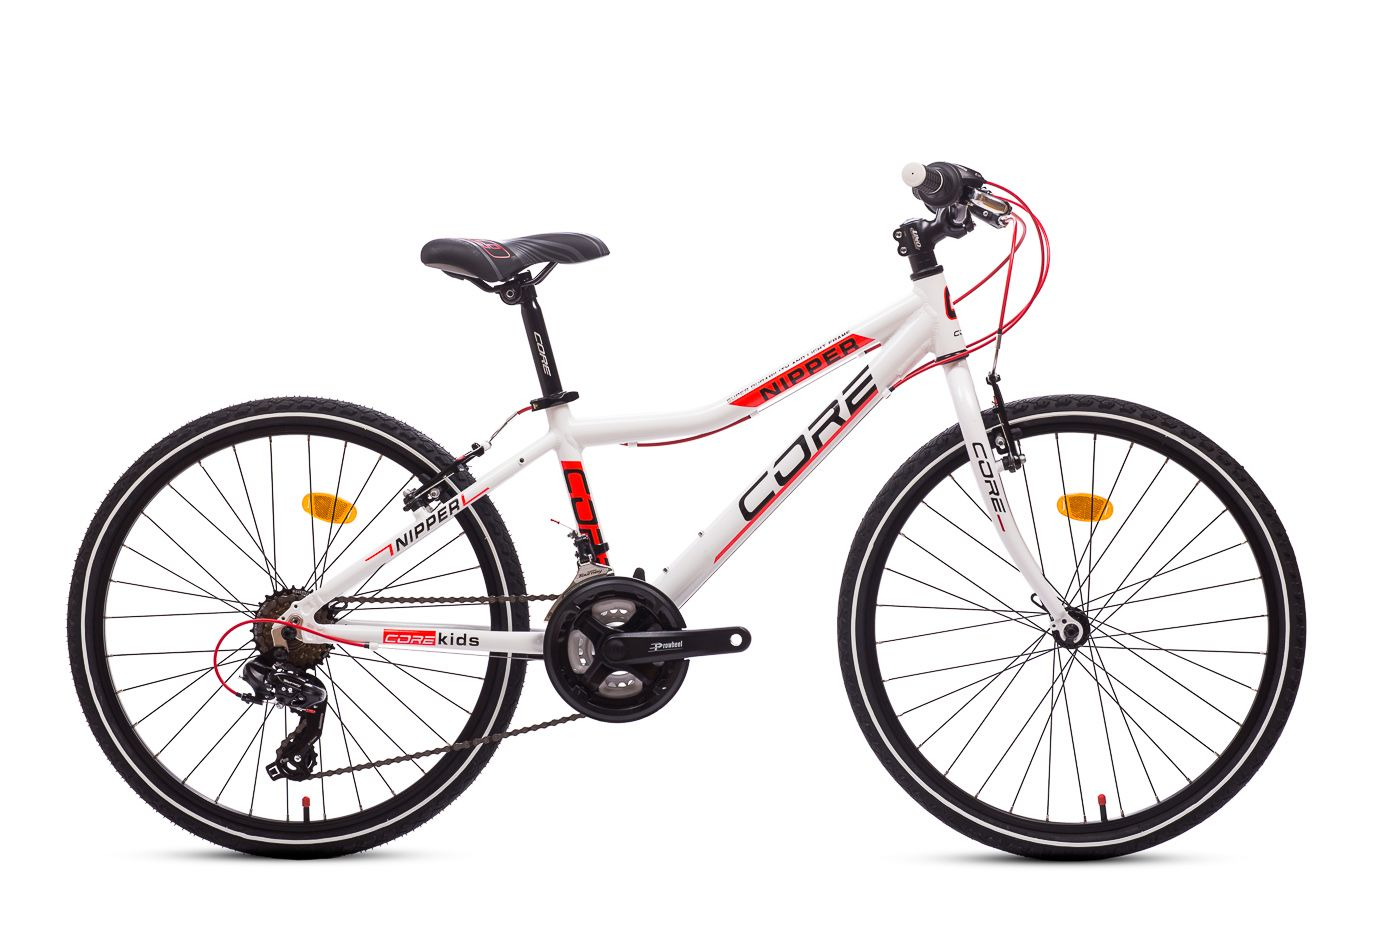 "Dětské kolo Core nipper 24"" bílá Sprinterbike"